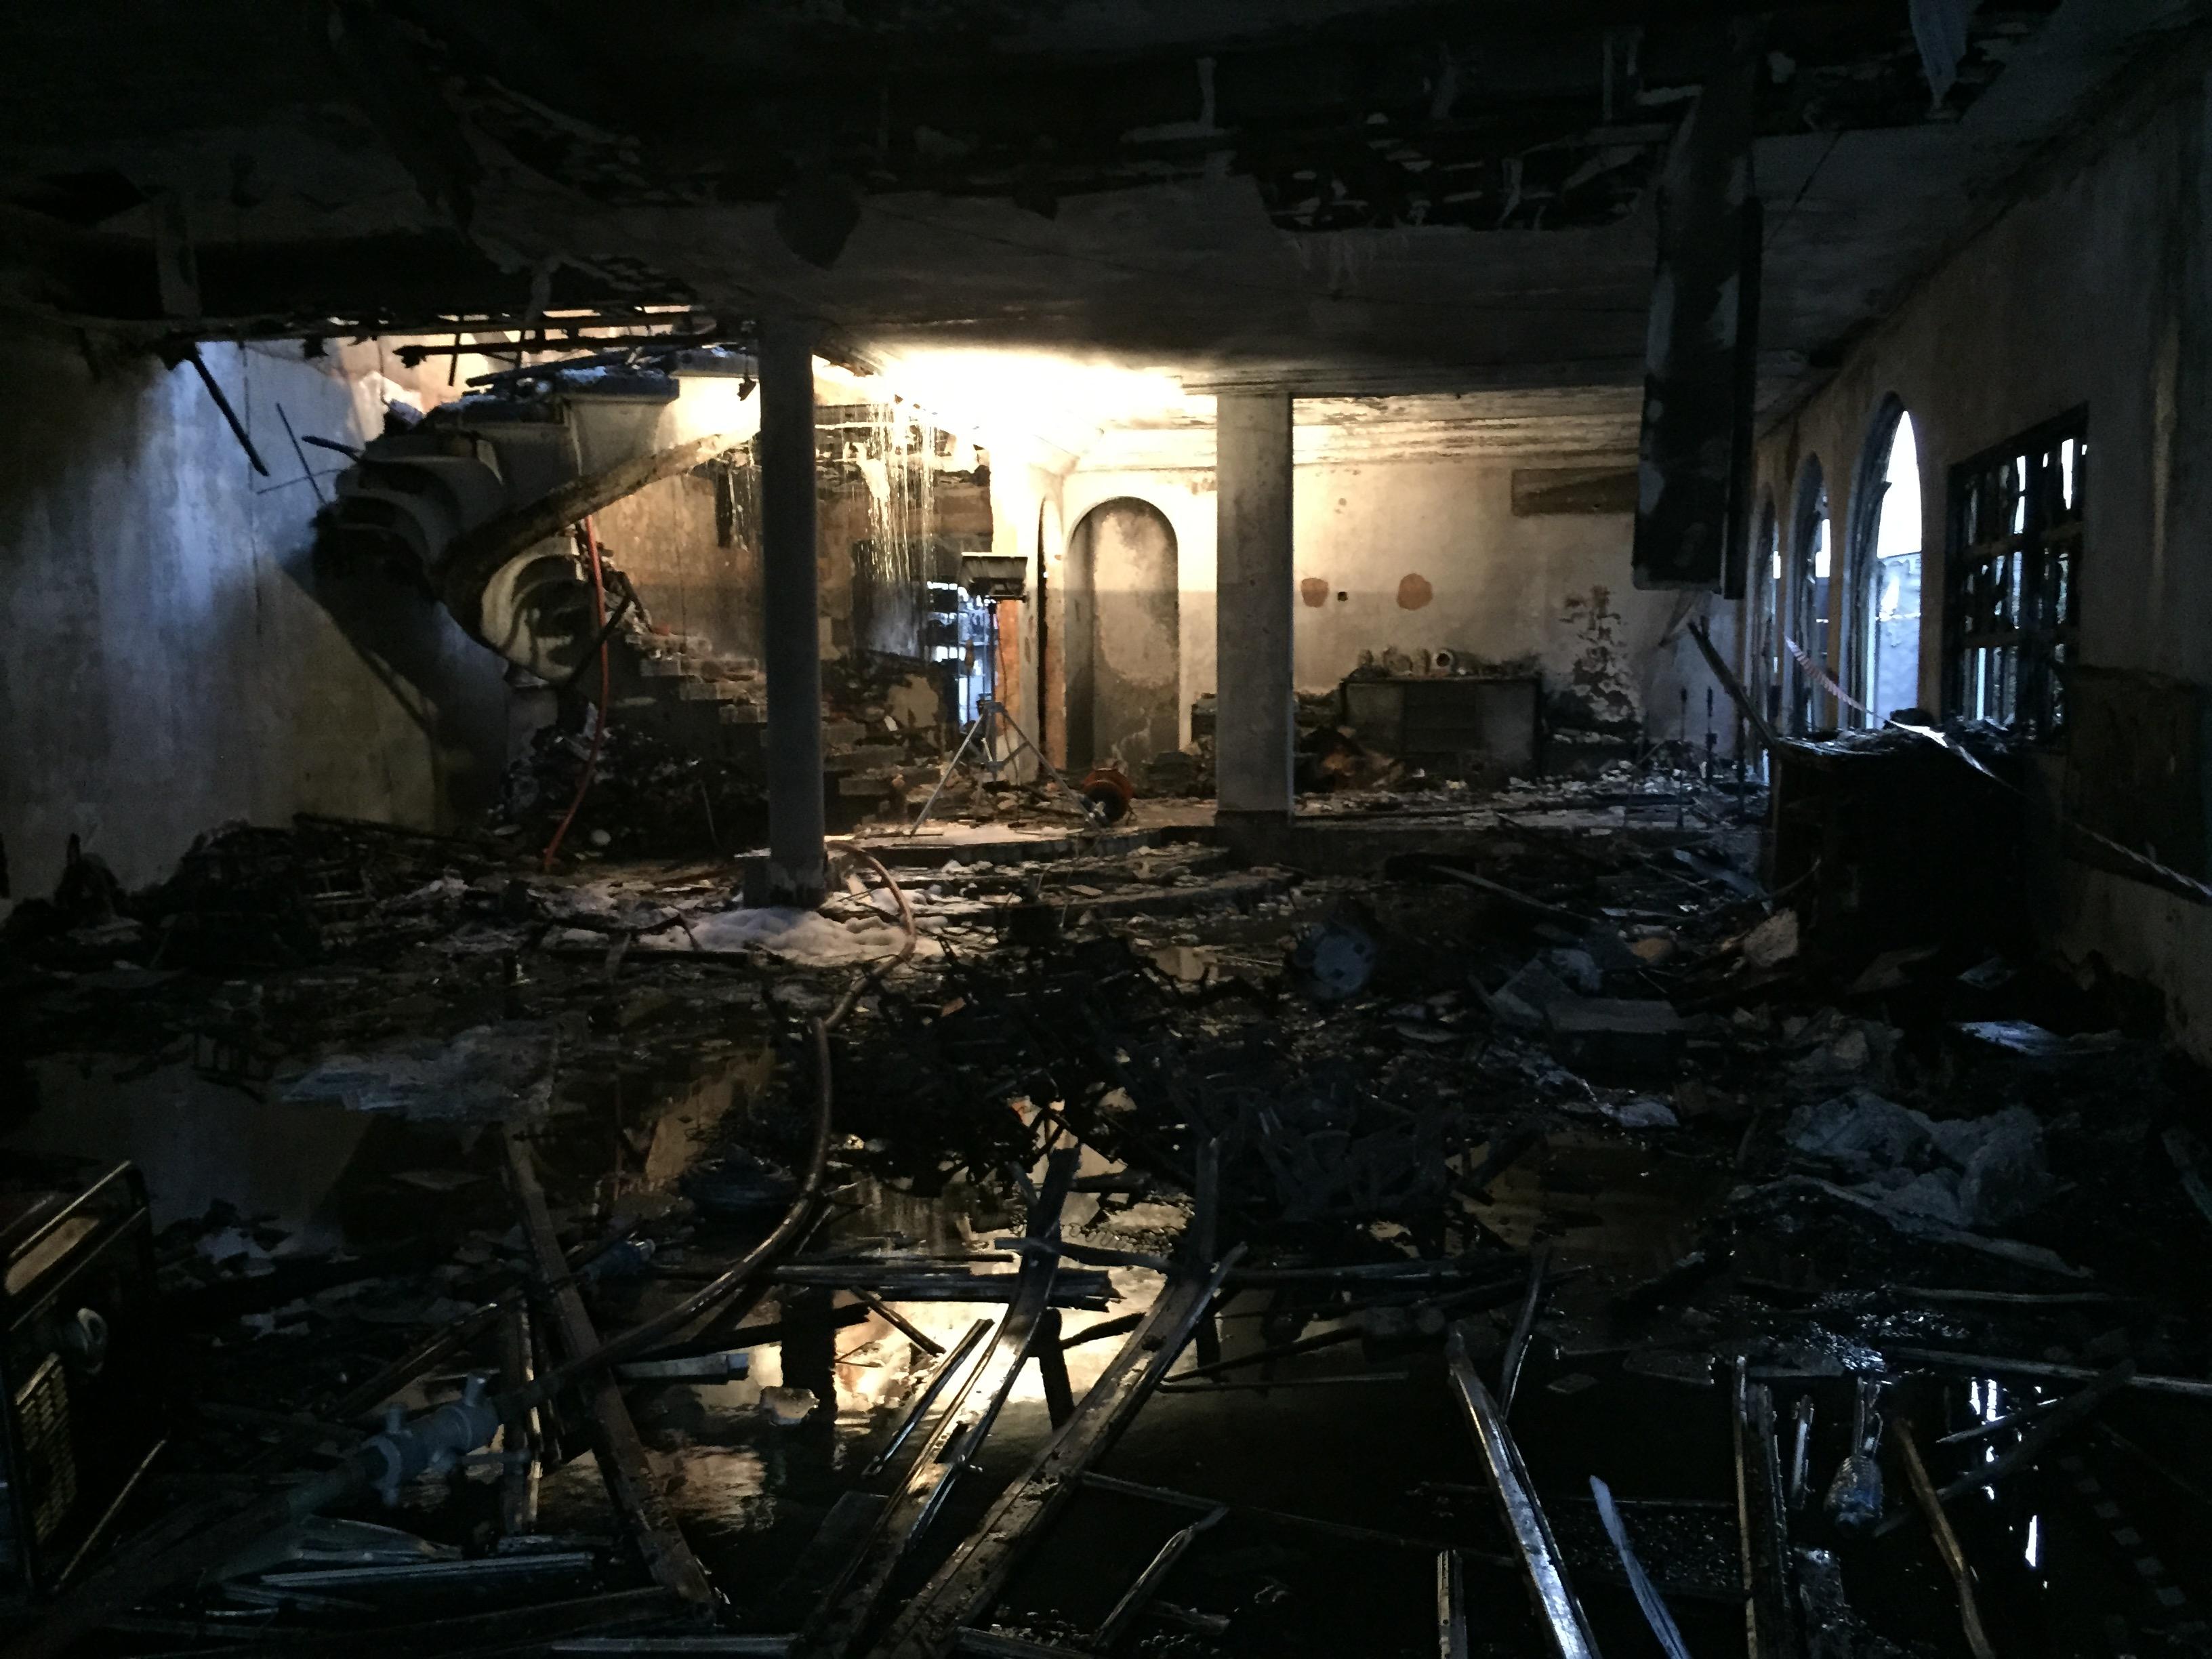 Massive Yio Chu Kang House Fire Kills 2, Injures 6 - MustShareNews.com